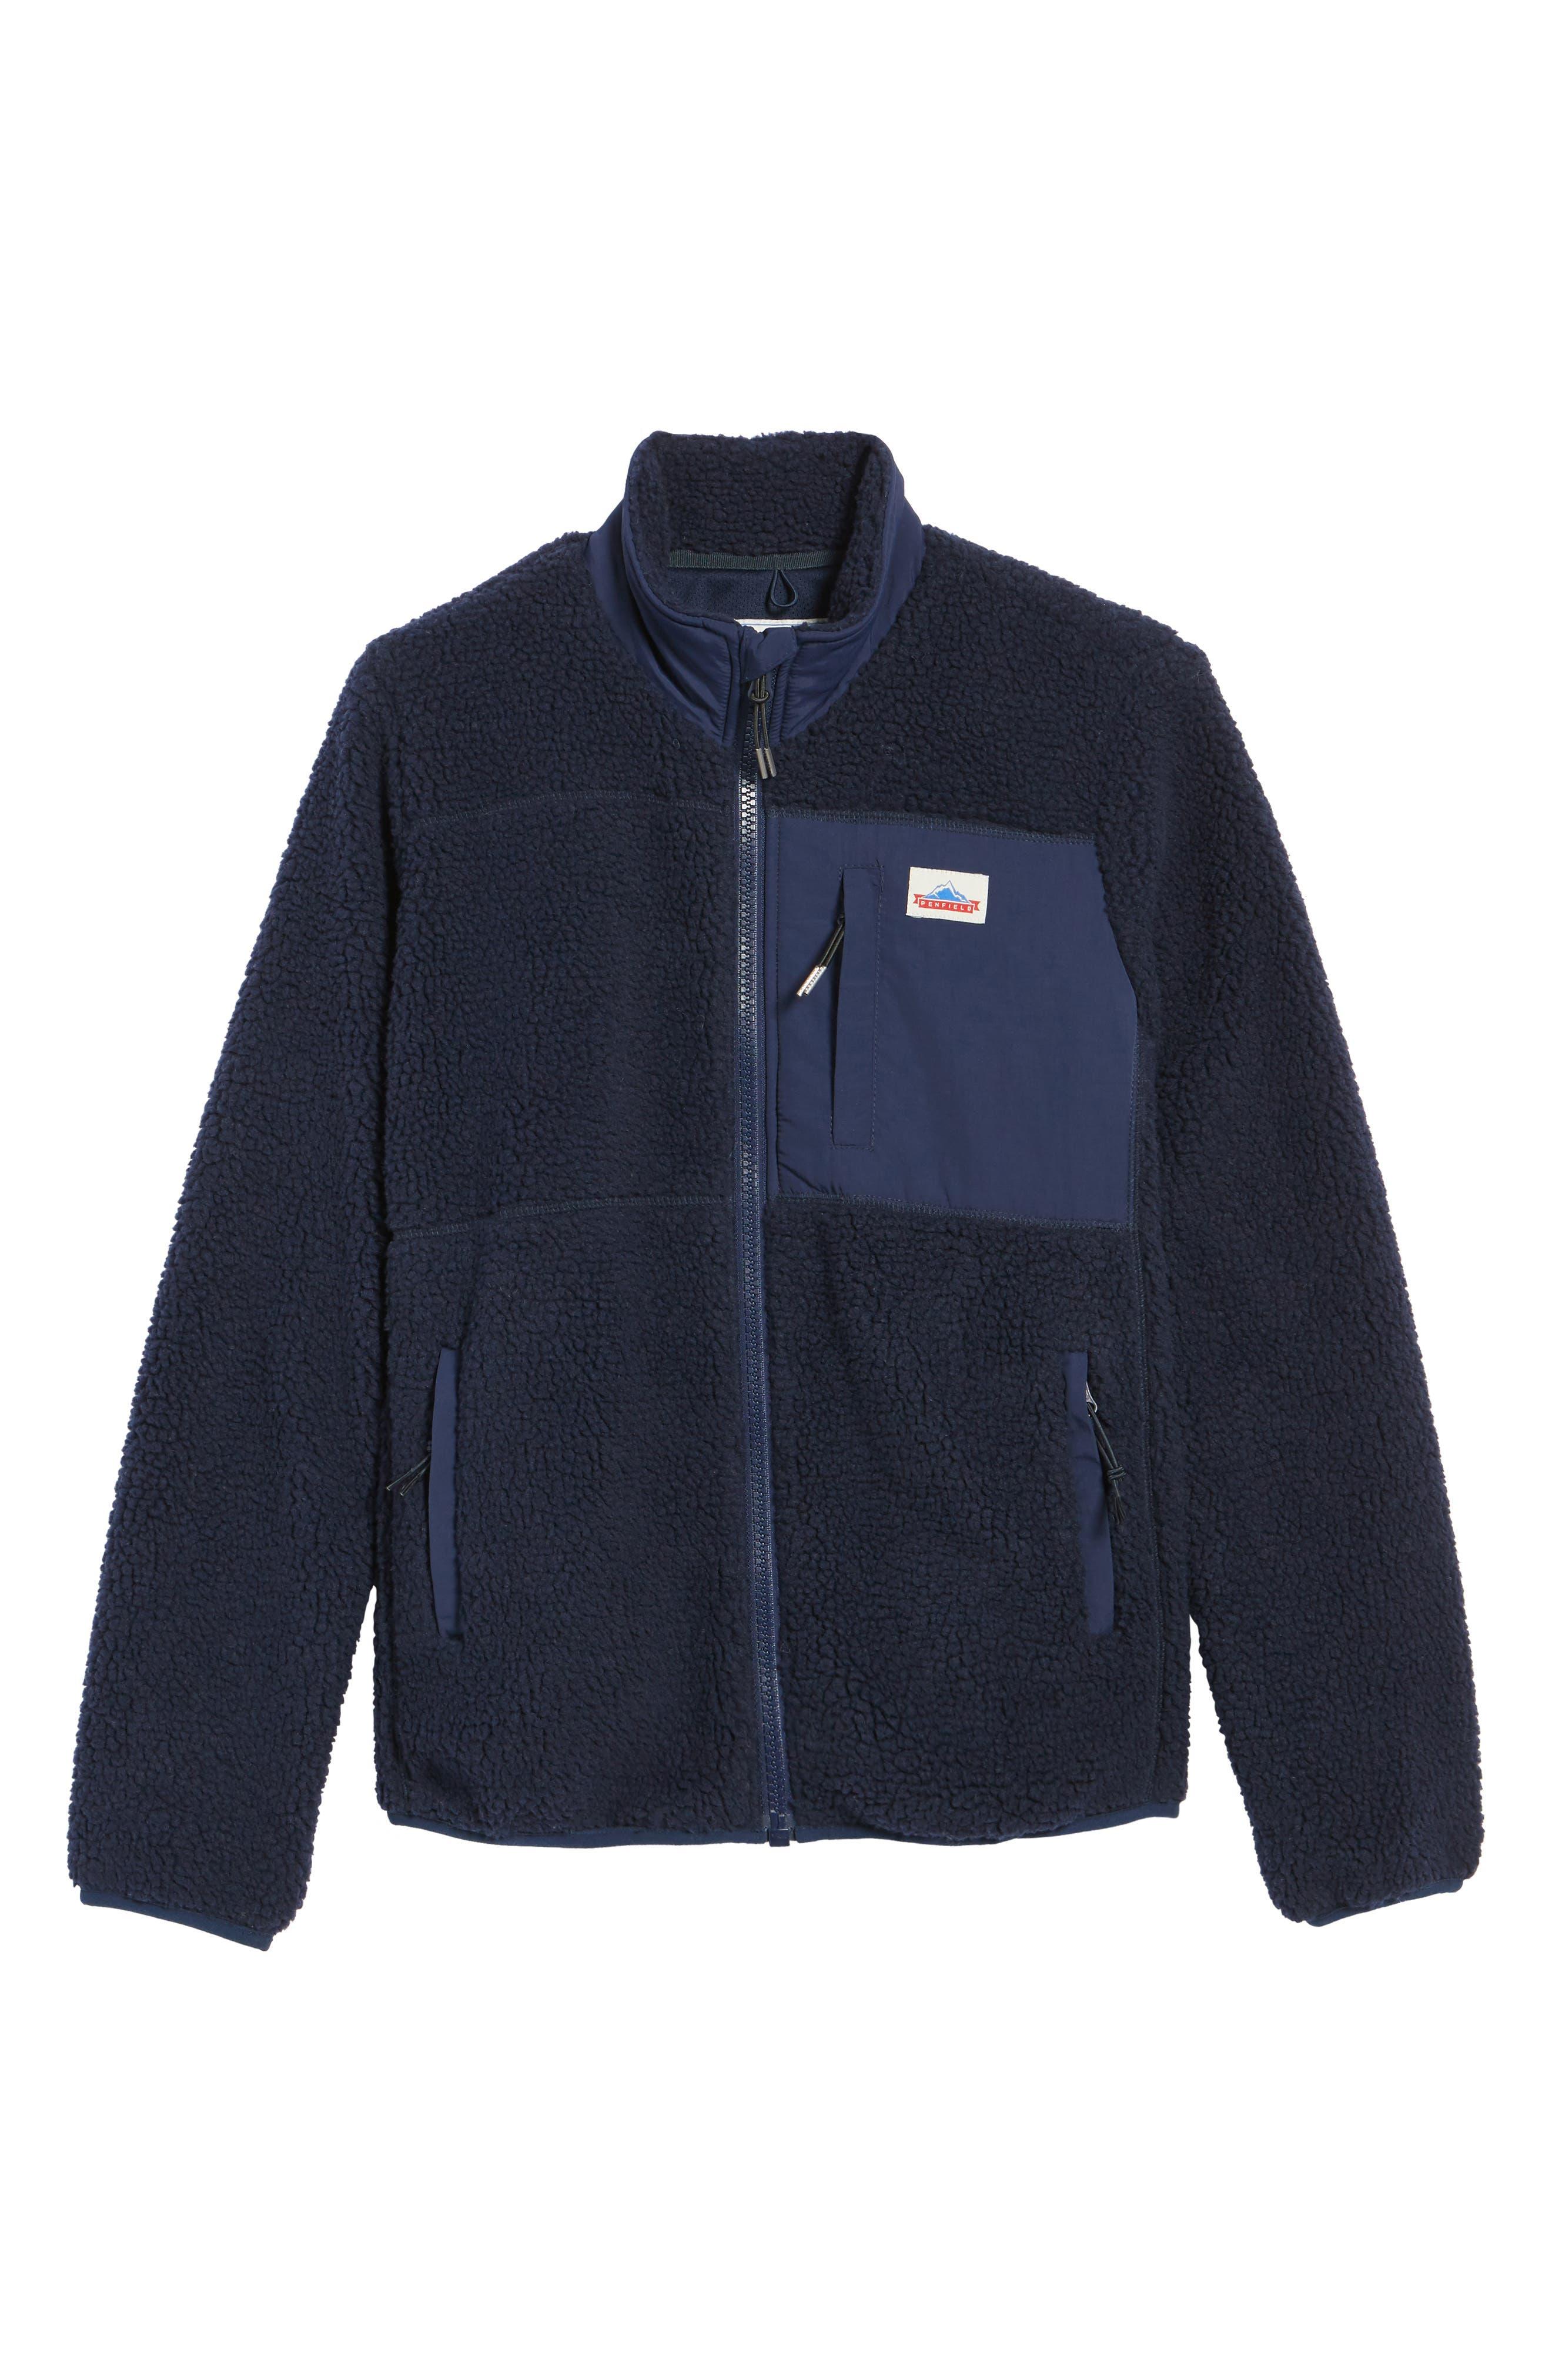 Mattawa Fleece Jacket,                             Alternate thumbnail 6, color,                             Navy